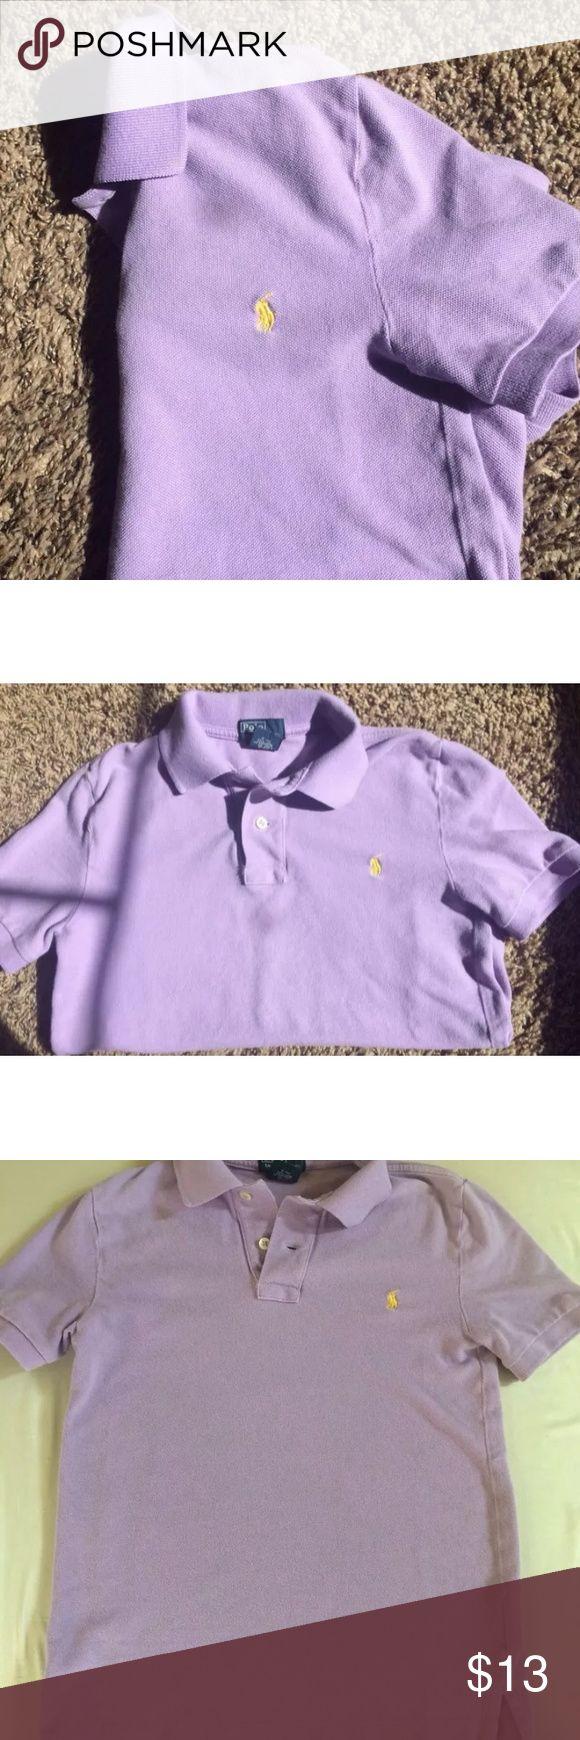 Boys Ralph Laure short sleeve polo Boys Ralph Lauren purple short sleeve polo size 8in good condition. Ralph Lauren Shirts & Tops Polos